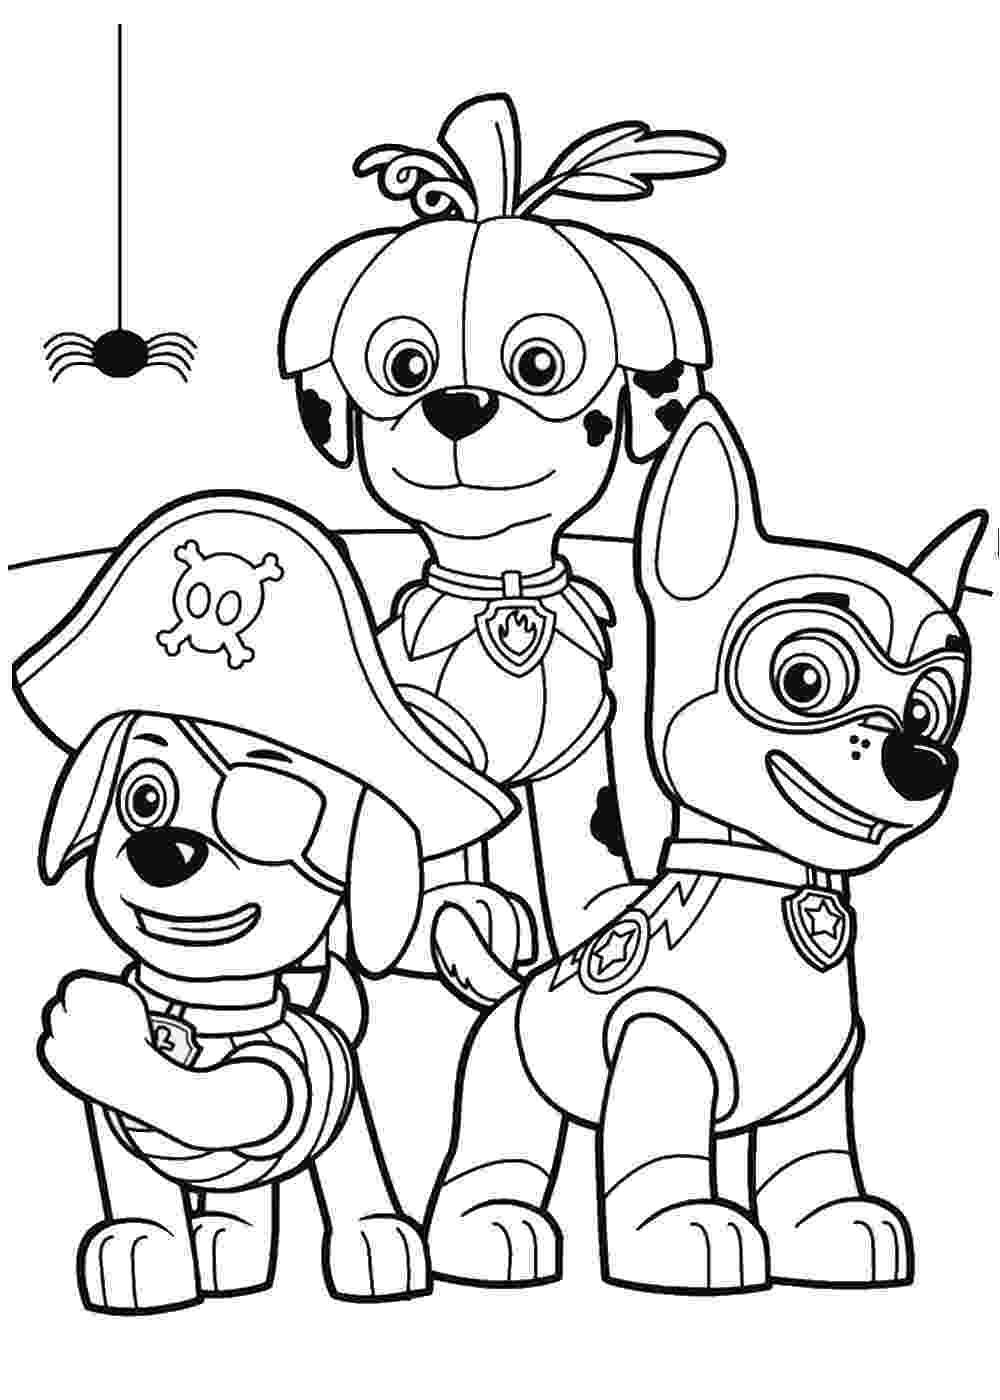 paw patrol coloring book paw patrol coloring page coloring home coloring paw book patrol